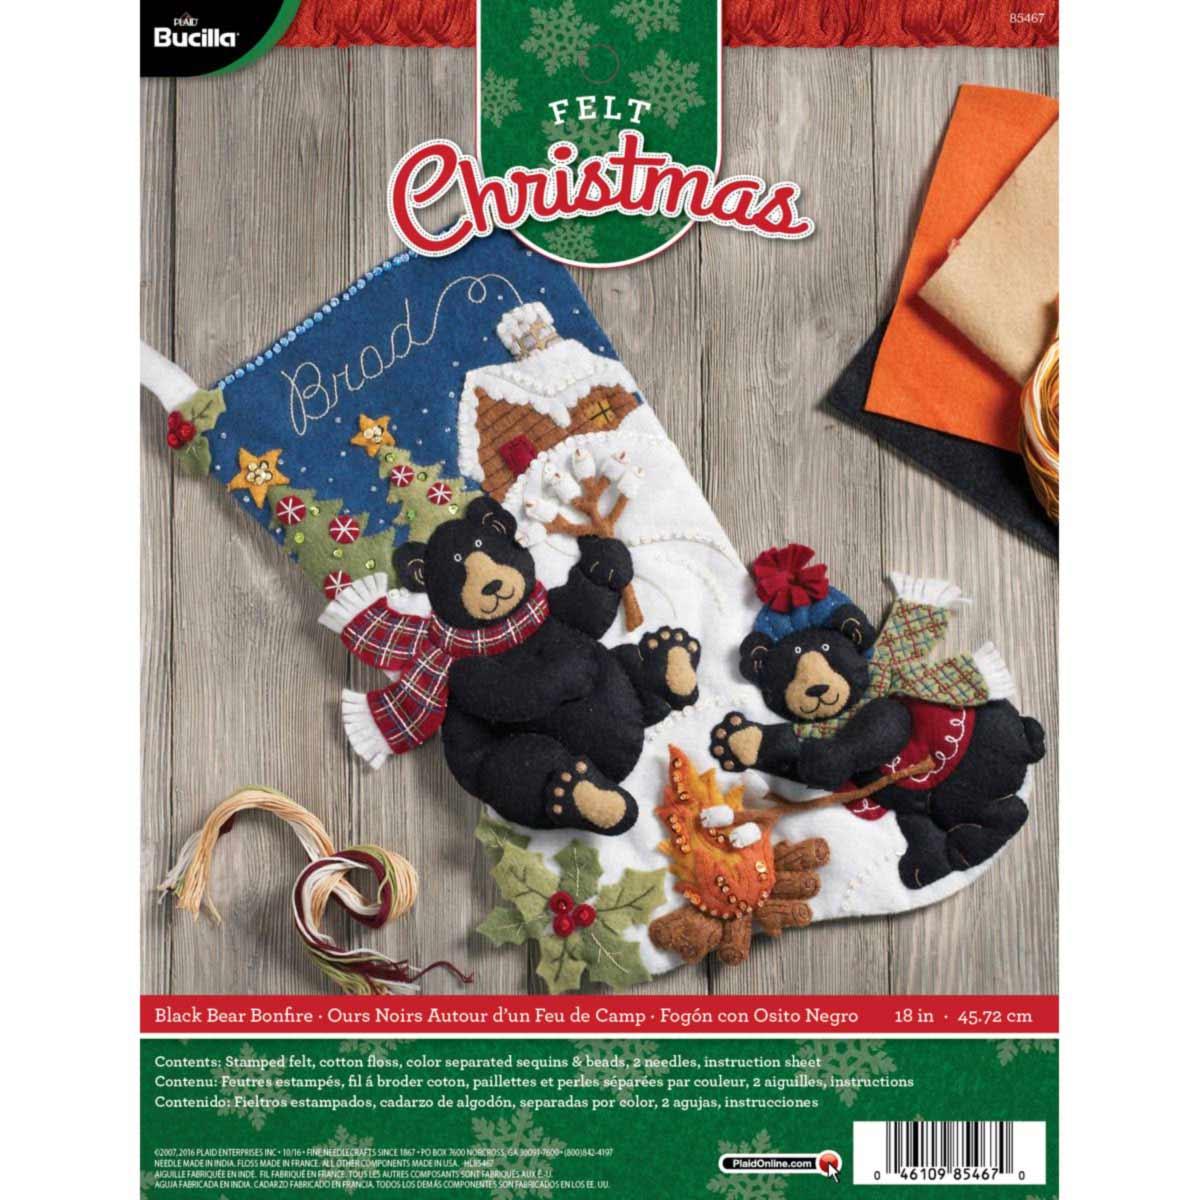 Bucilla ® Seasonal - Felt - Stocking Kits - Black Bear Bonfire